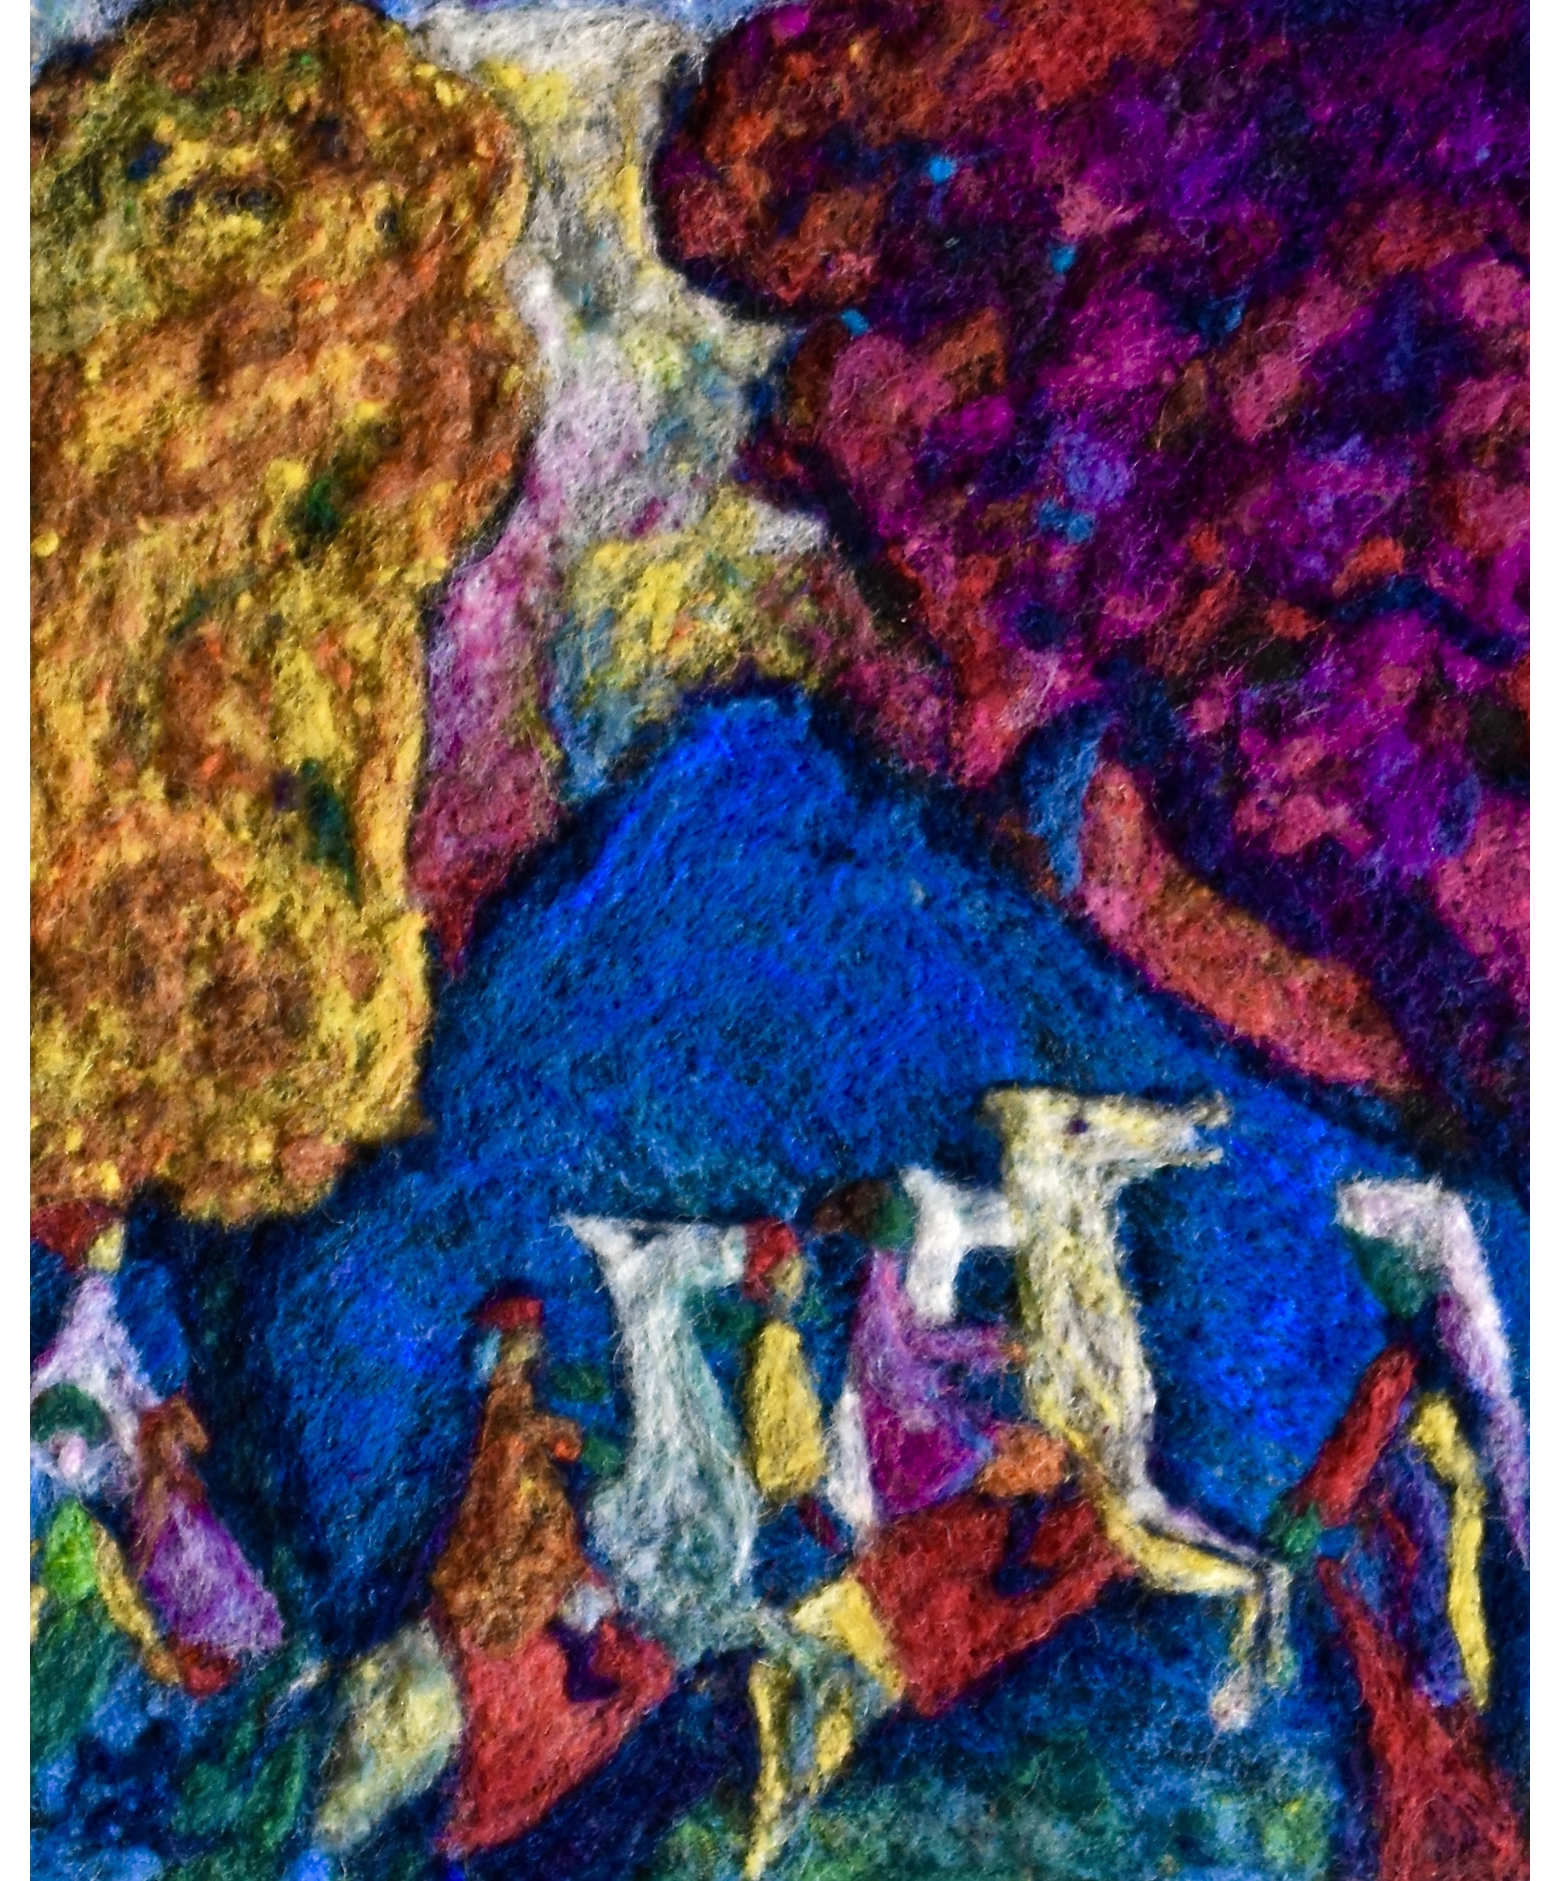 49_1_Mary_Lor_After Kandinsky's Blue Mountain copy.jpg